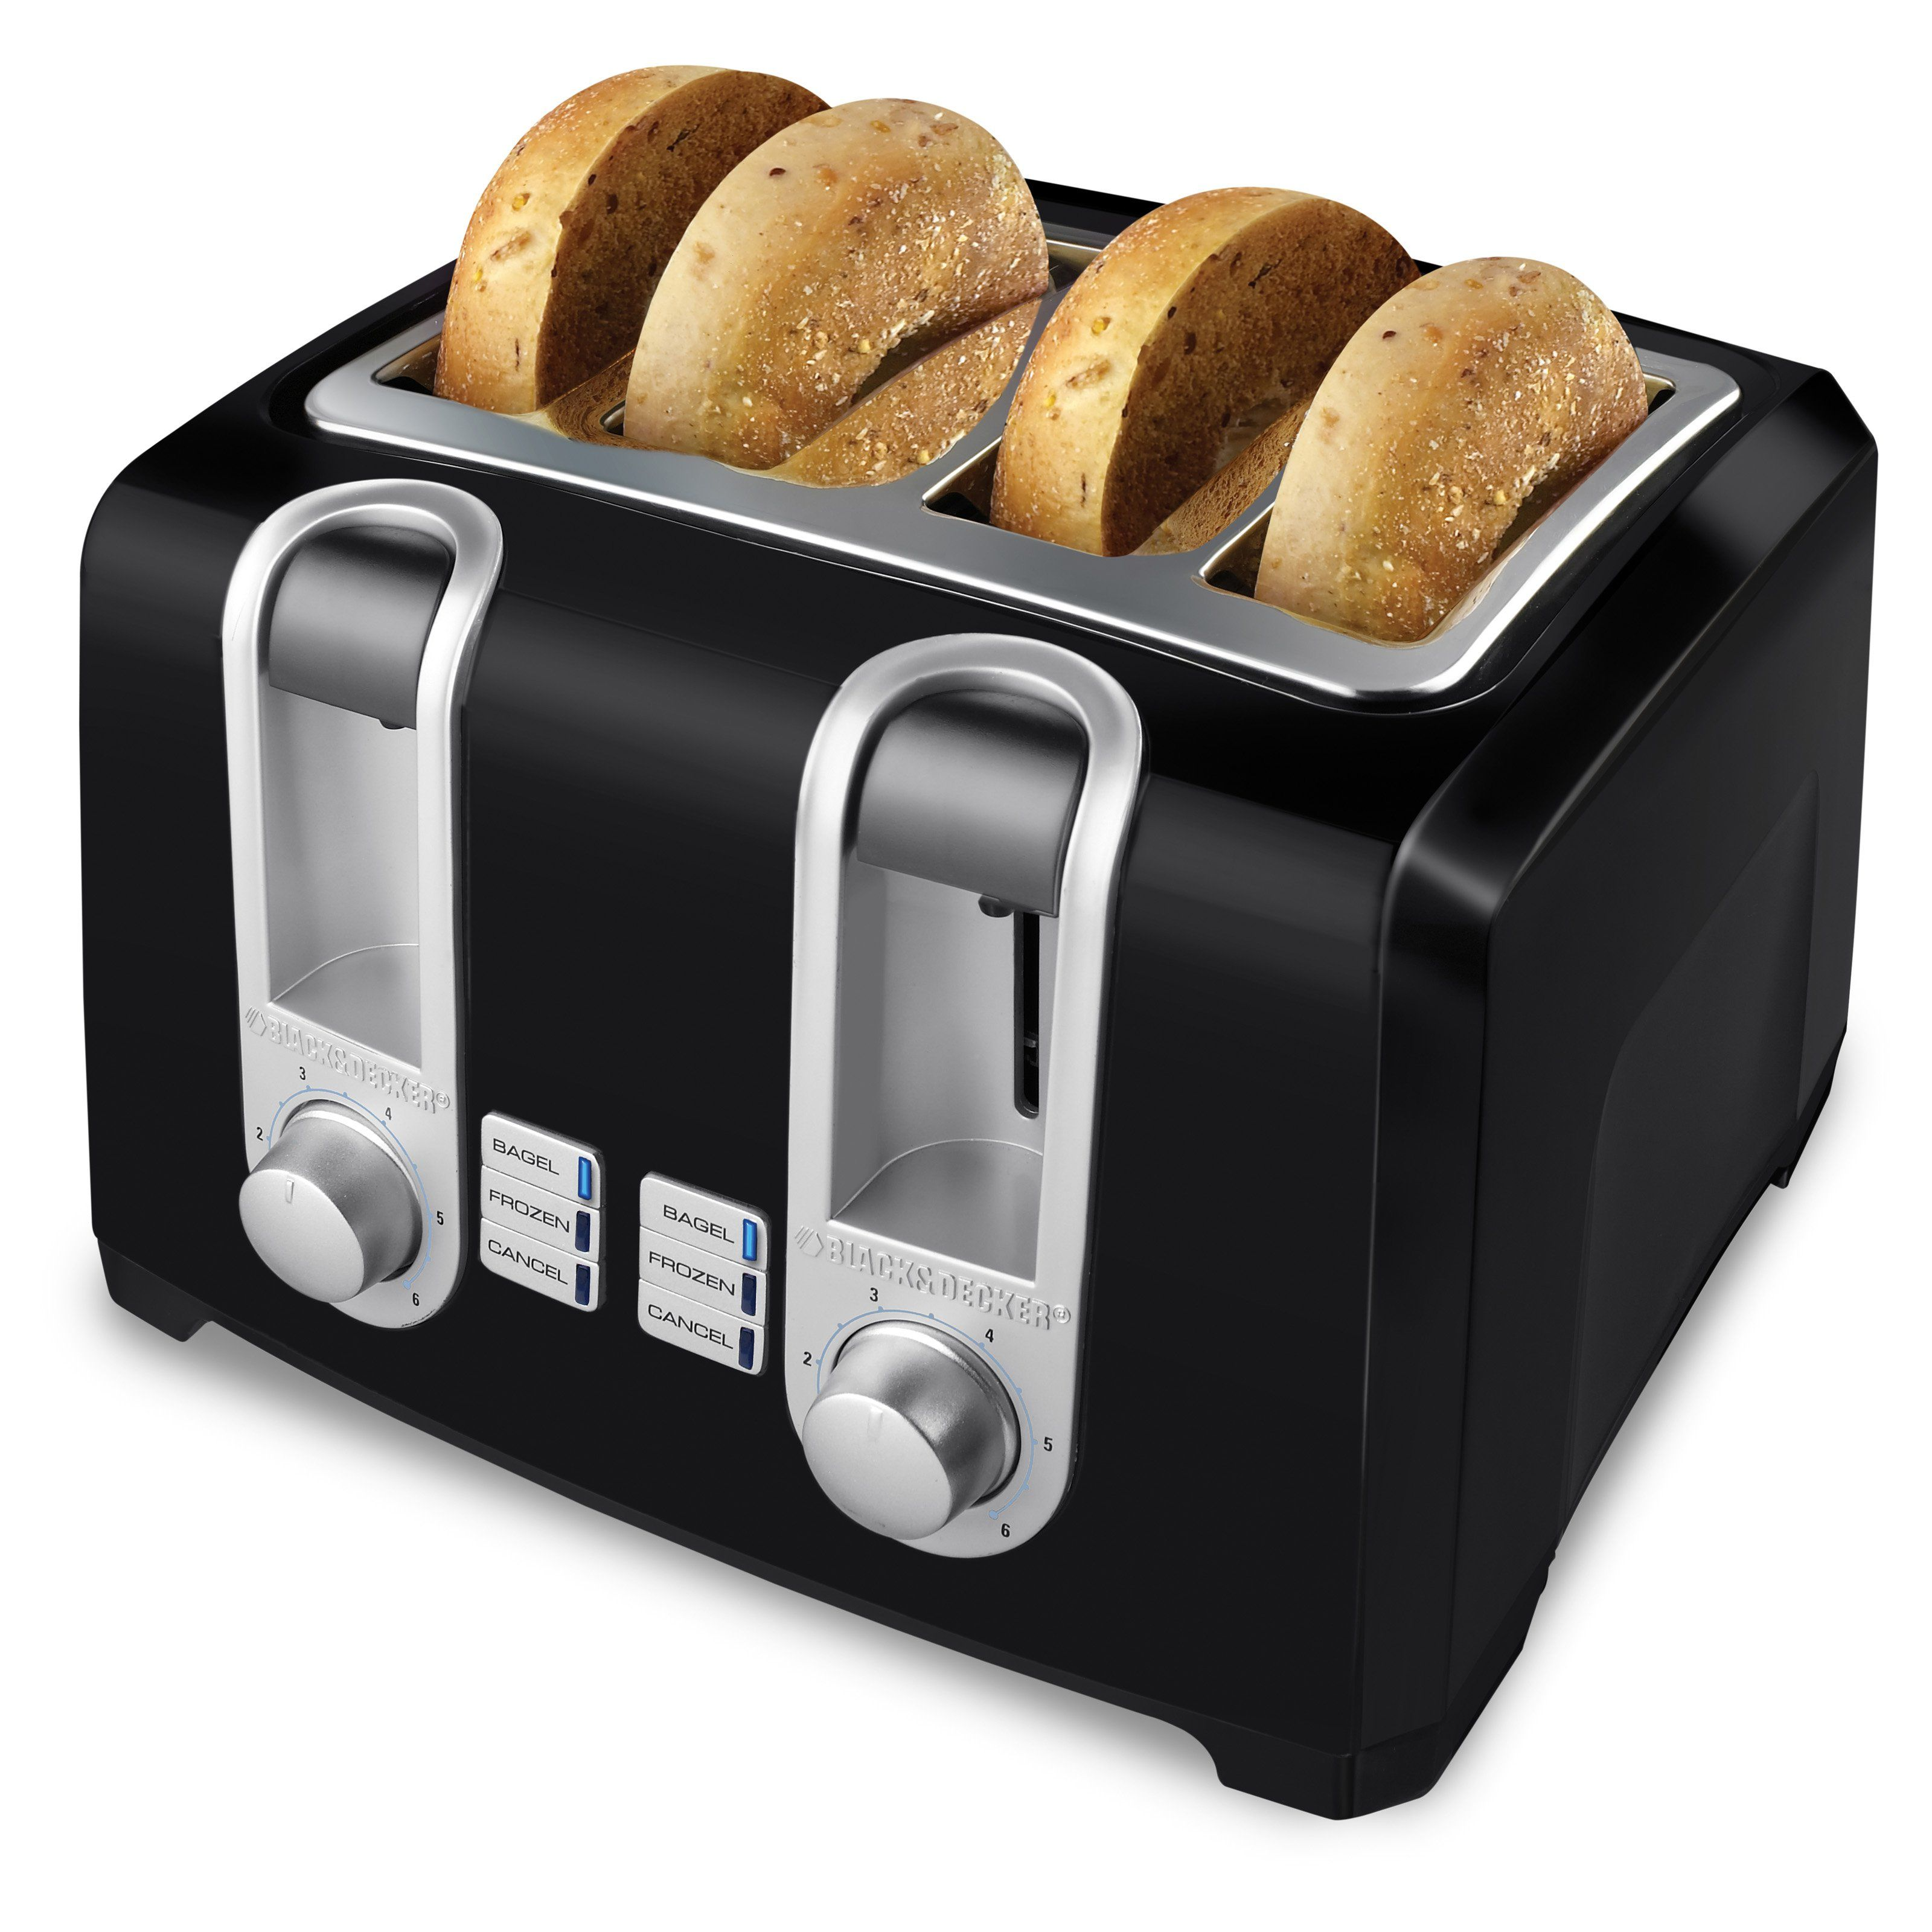 Black Decker T4569b 4 Slice Toaster Black 050875803473 Black Toaster Four Slice Toaster Toaster